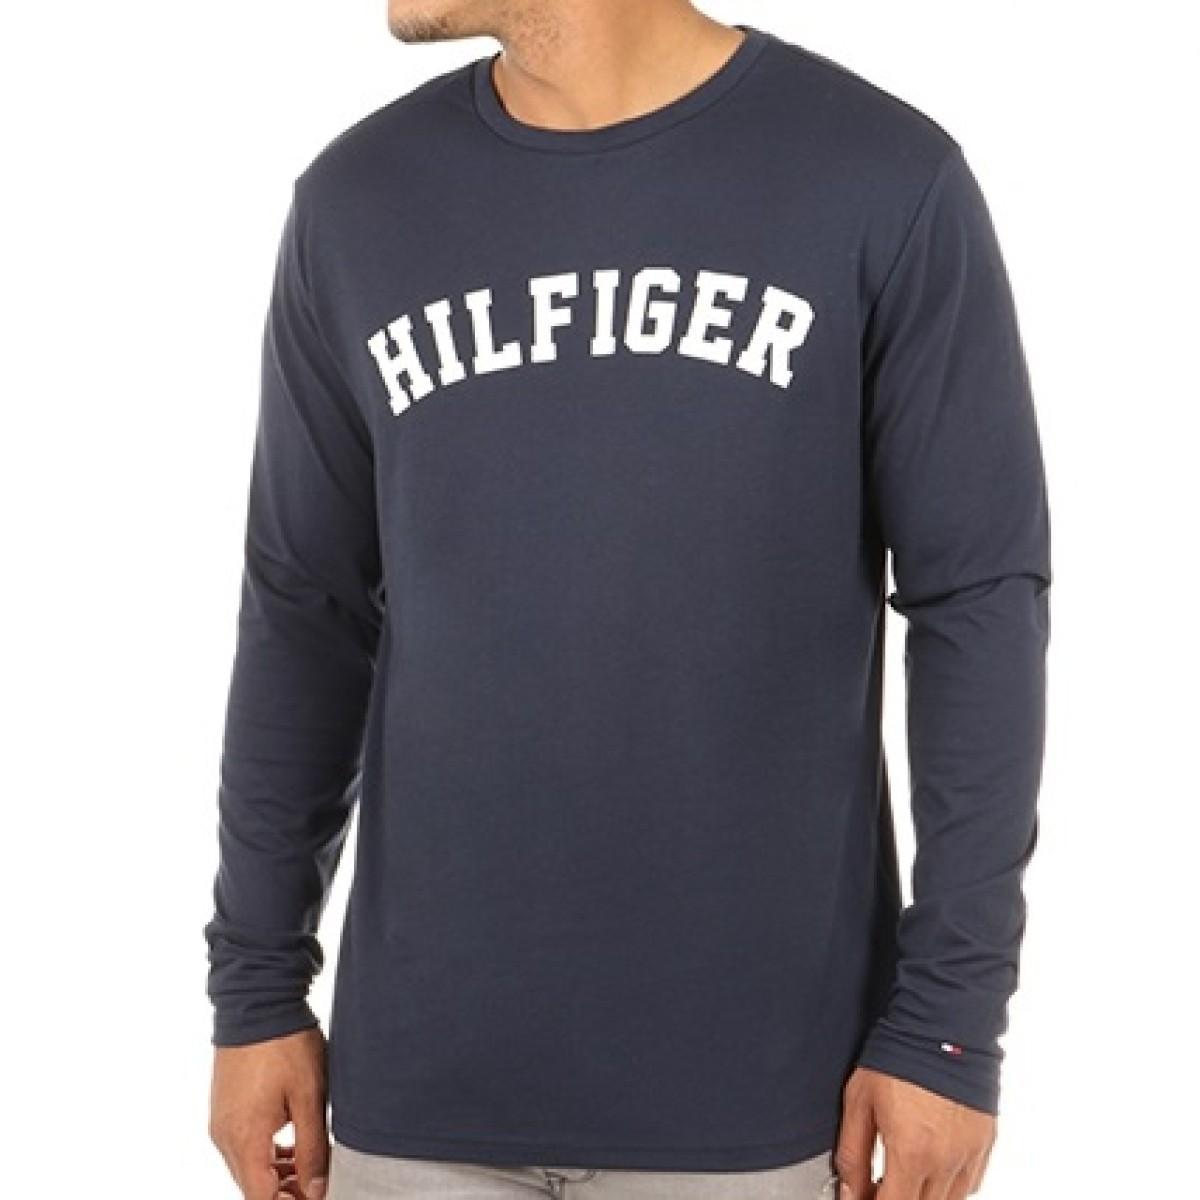 c050265aed63 Μη Διαθέσιμο T-shirt μακρύ μανίκι Logo Tommy Hilfiger UM0UM00292 - μπλε  Ανδρικά